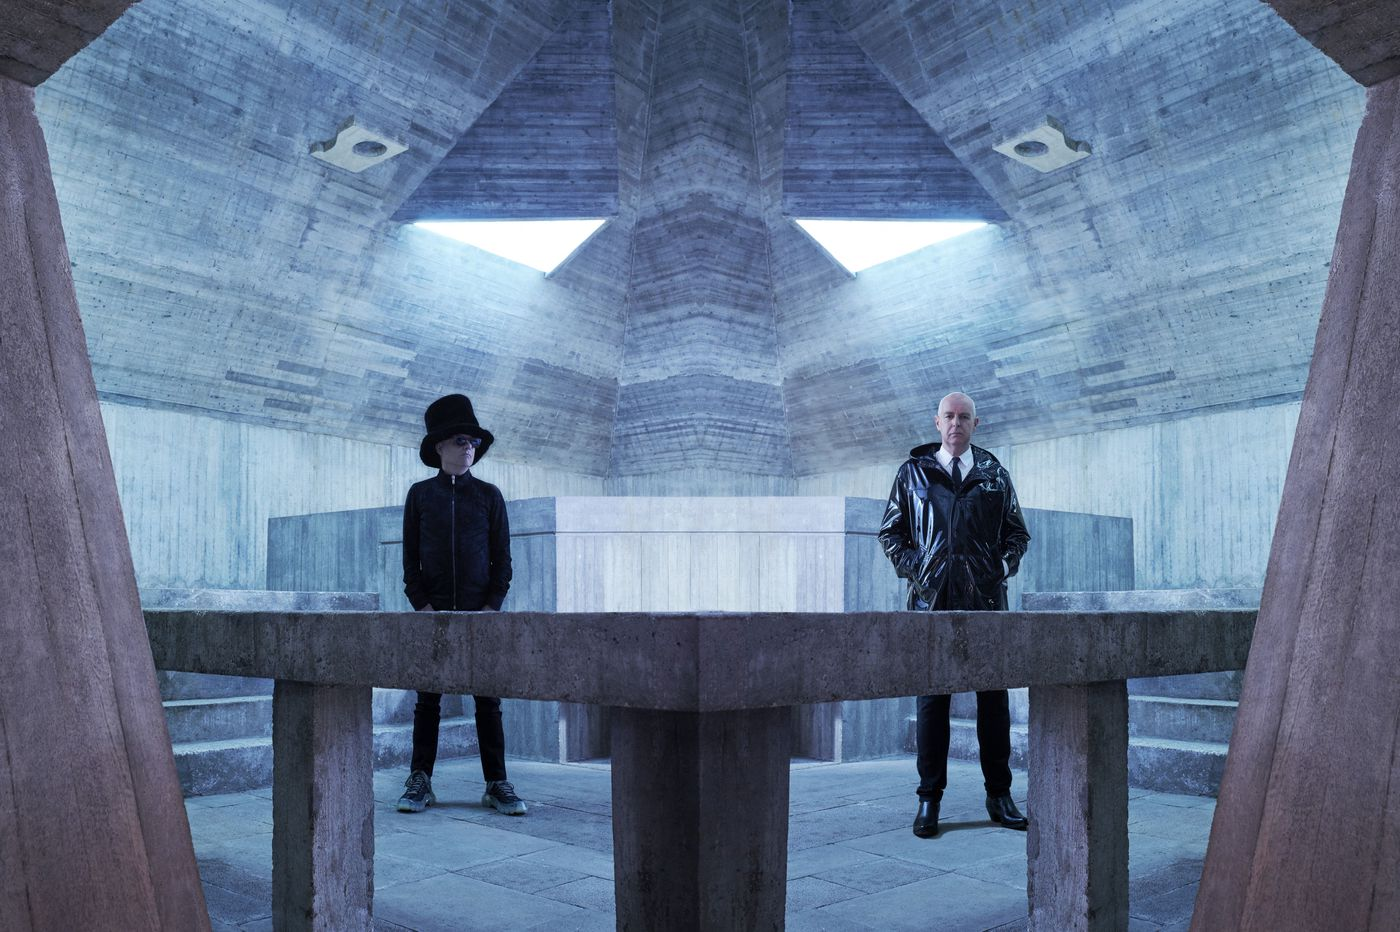 Album reviews: Pet Shop Boys, Lil Wayne, Tami Neilson